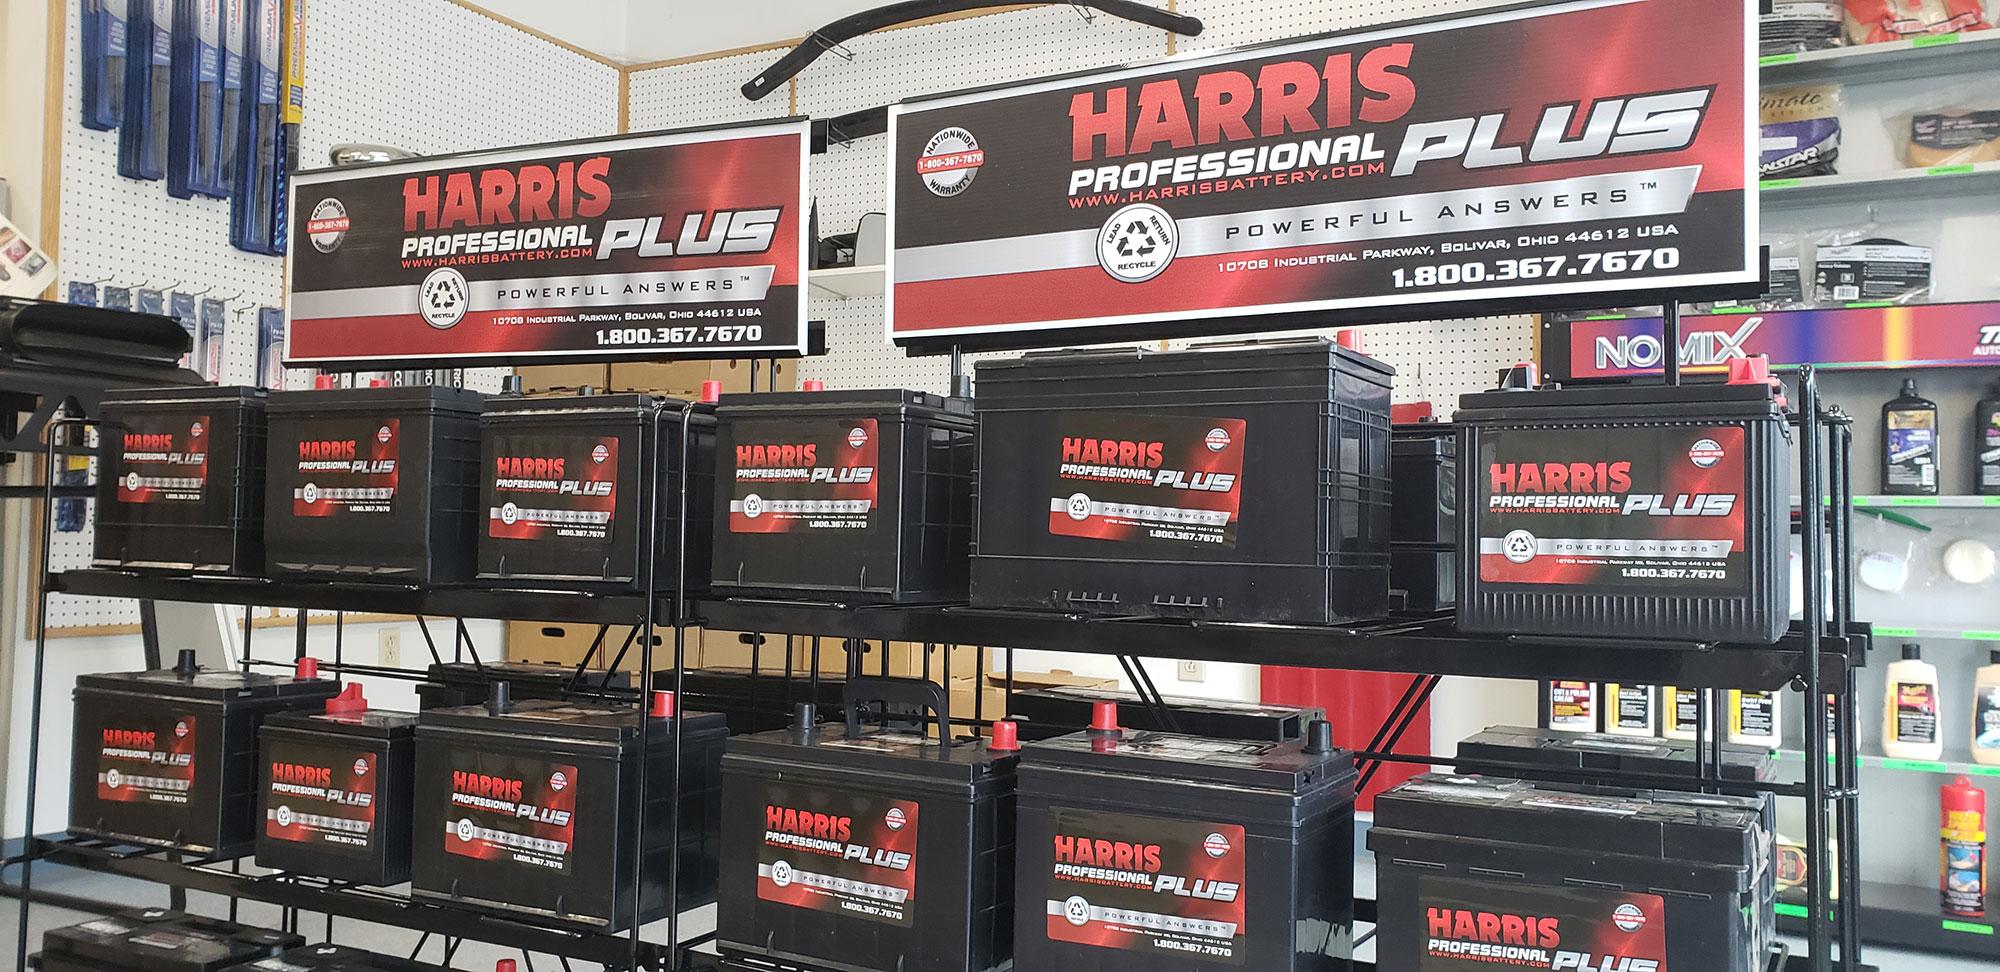 Harris Professional Plus Batteries